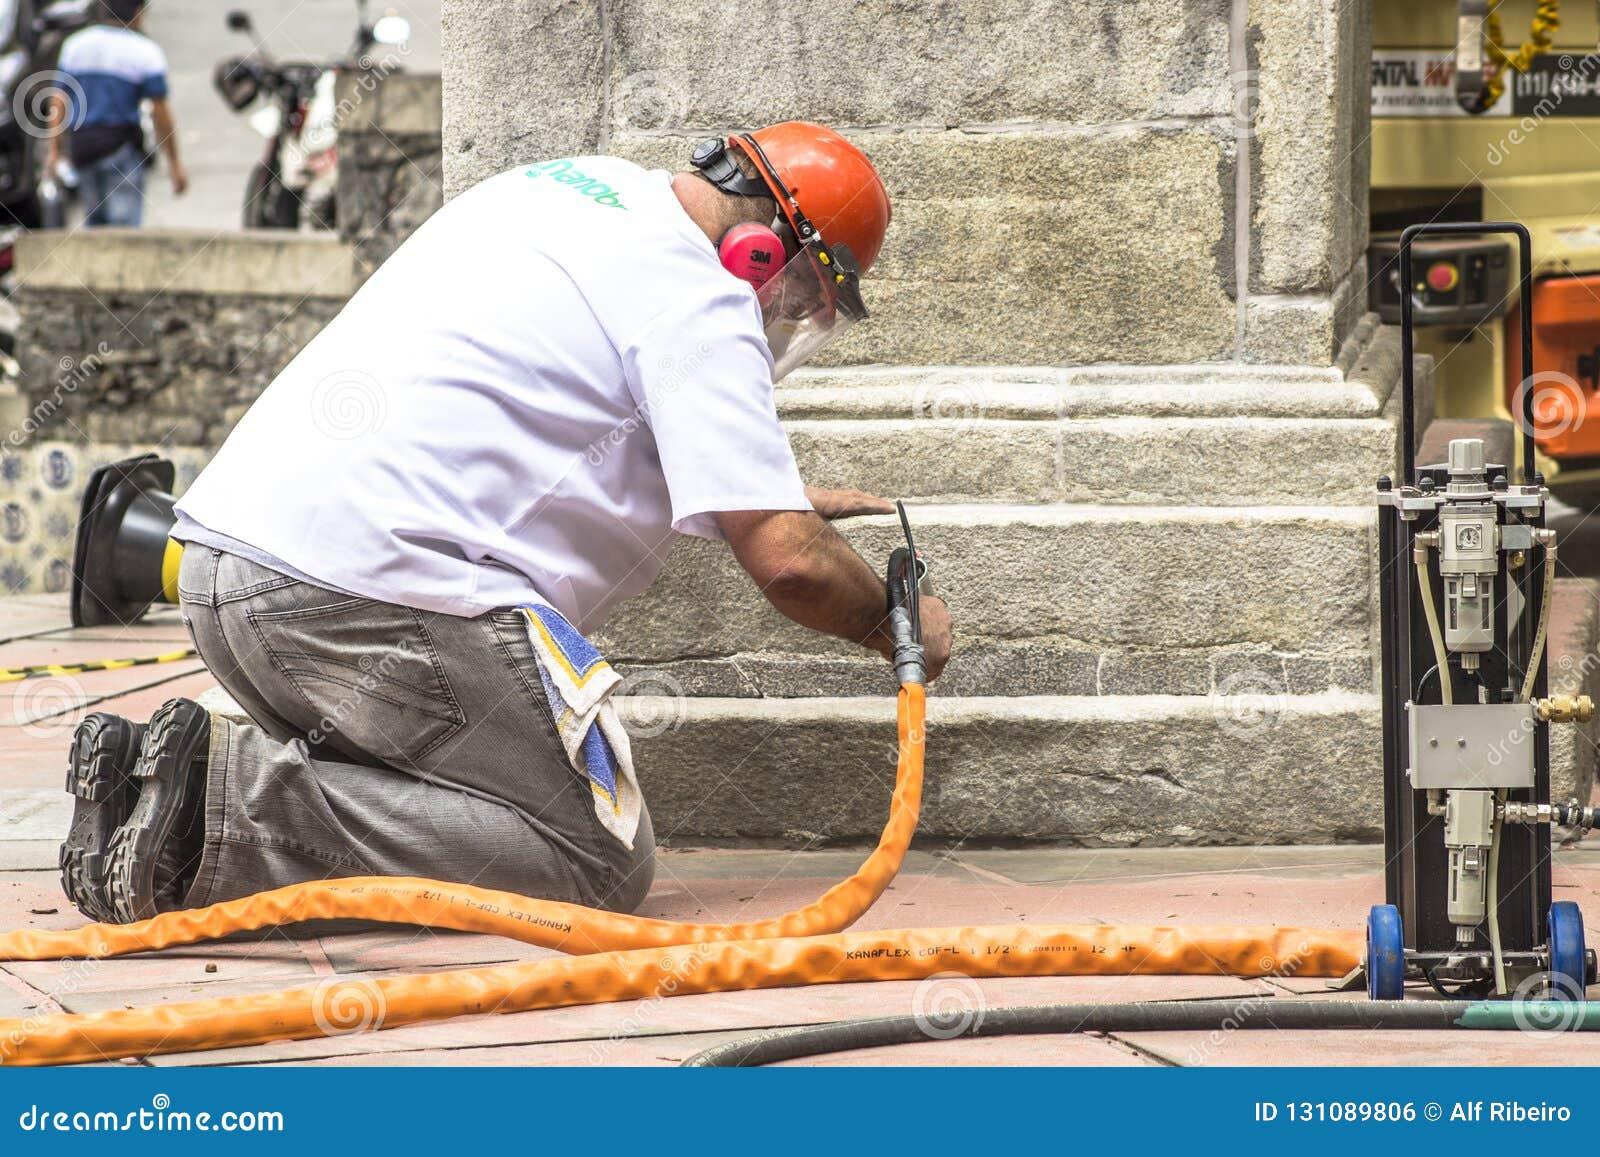 Work to clean vandalism graffiti, waterproof and restore the Obelisco da Memoria